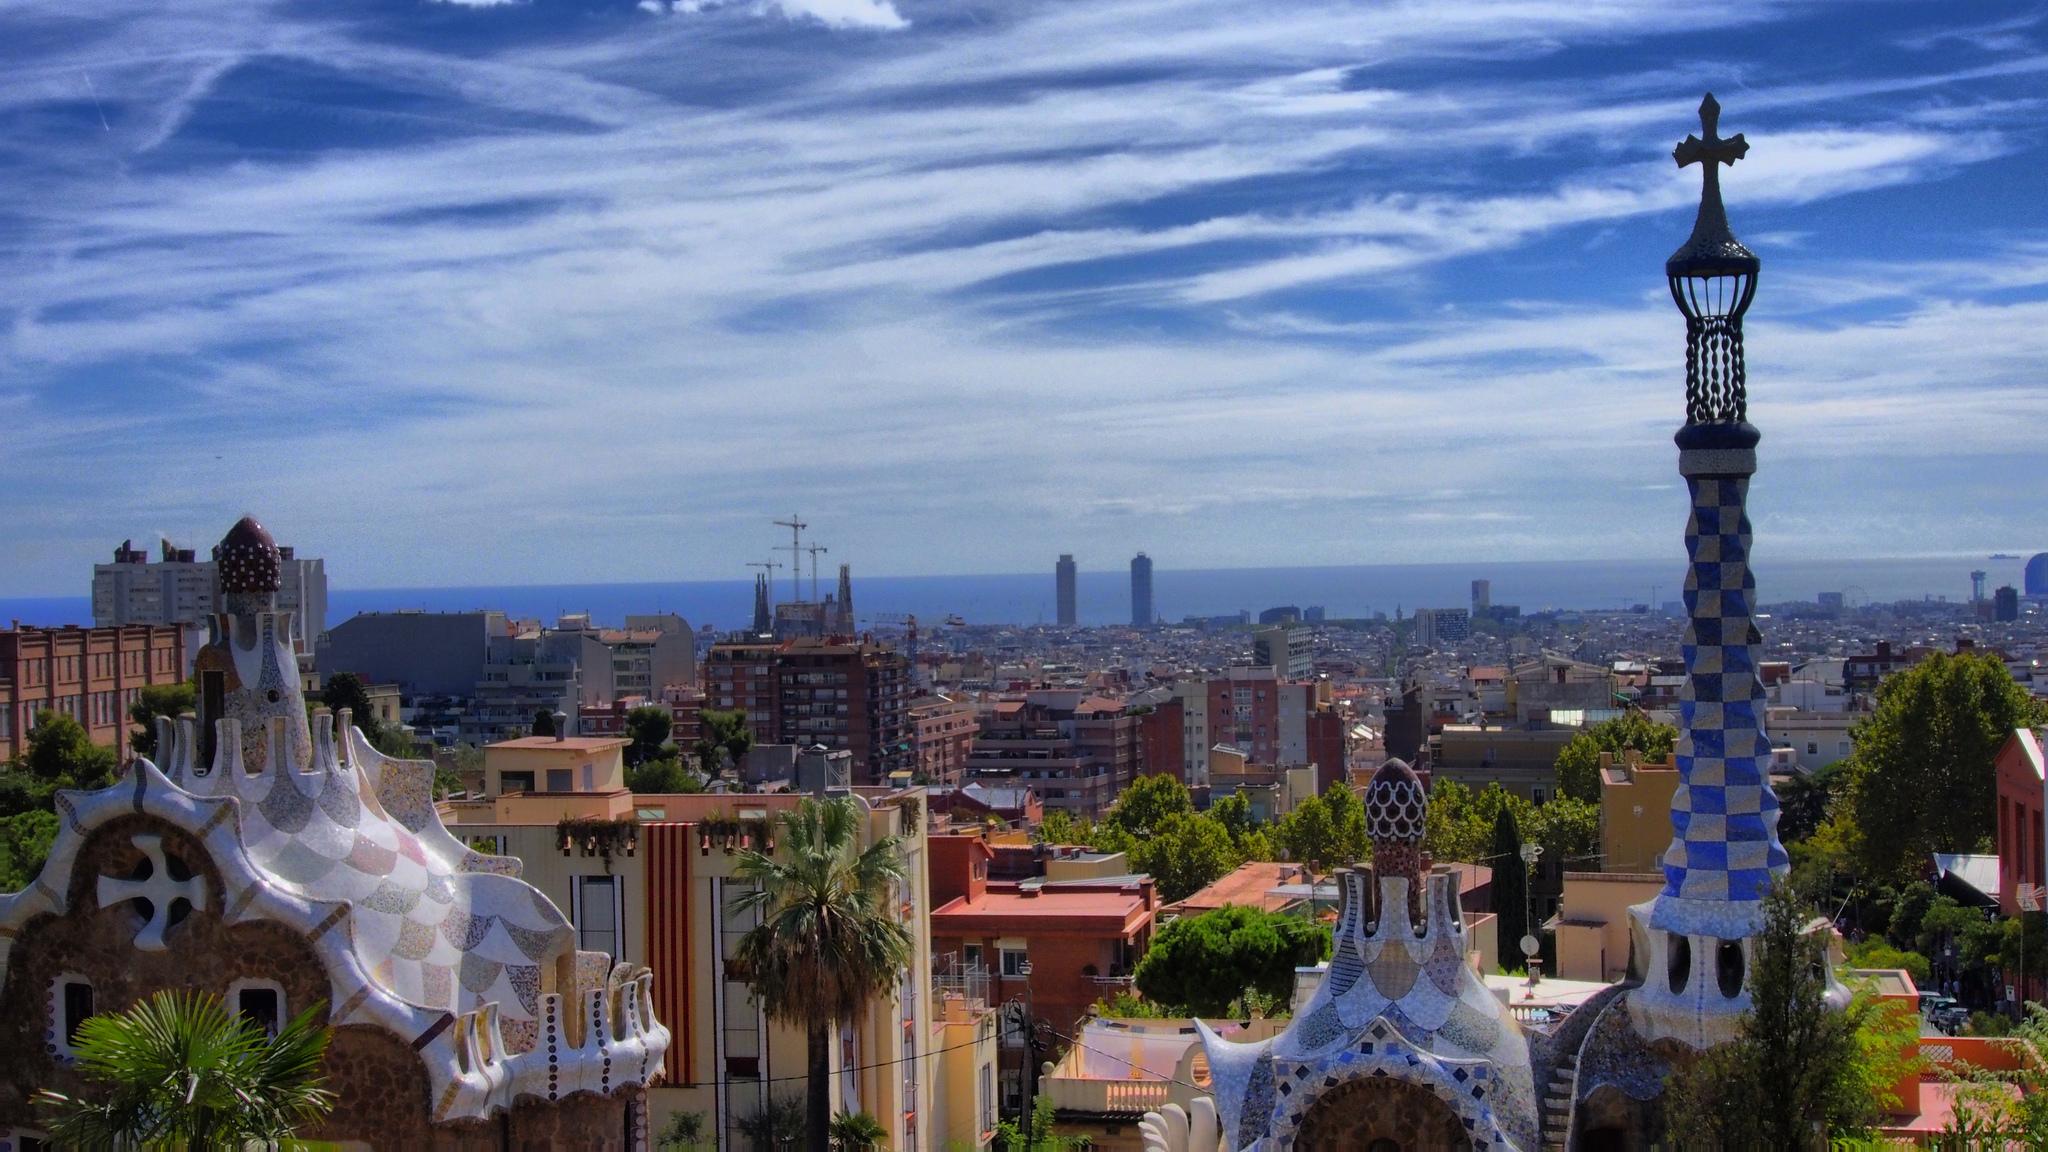 Barcelona Parque Guell Instagram